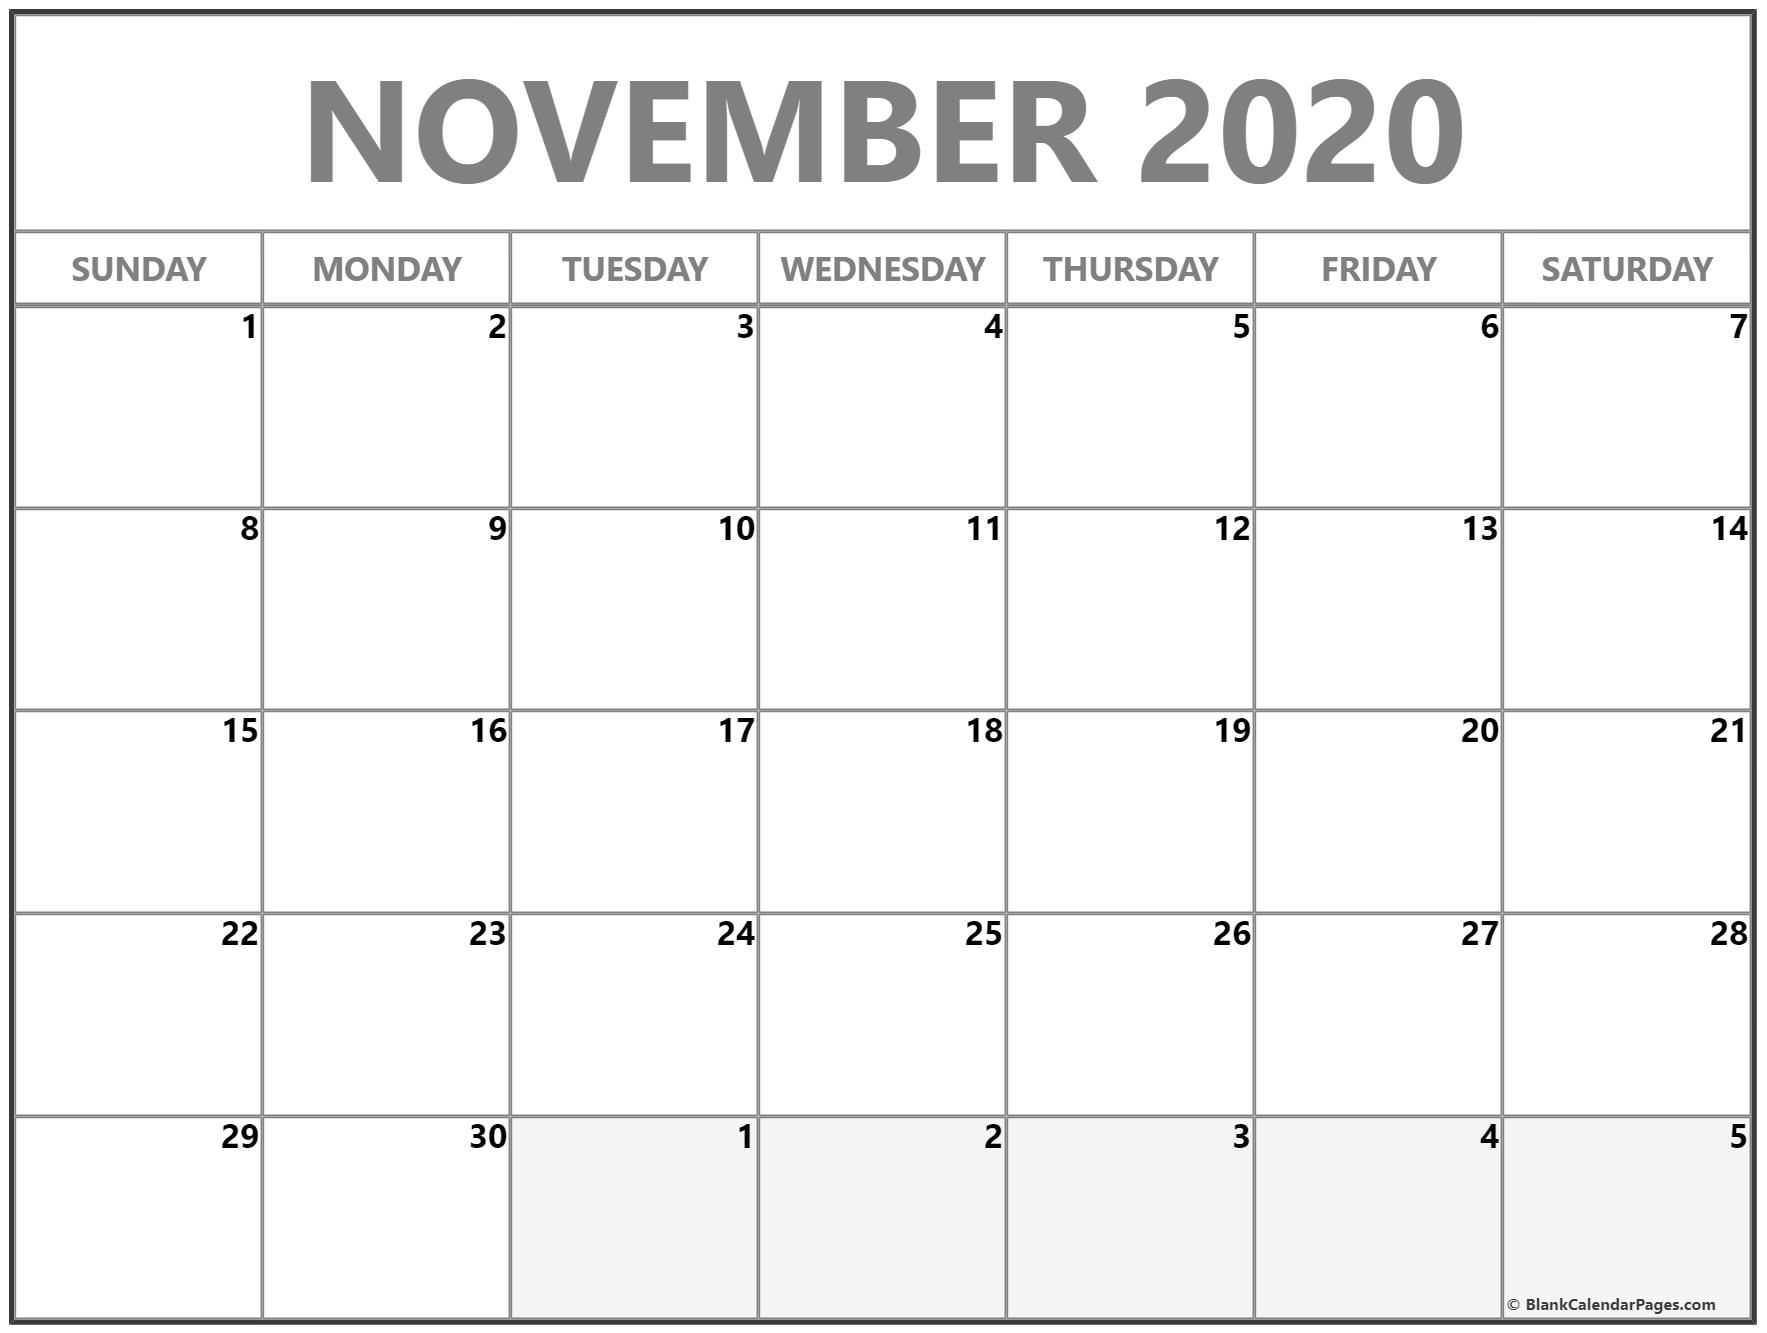 007 Awesome Printable Calendar Template November 2020 Photo  FreeFull